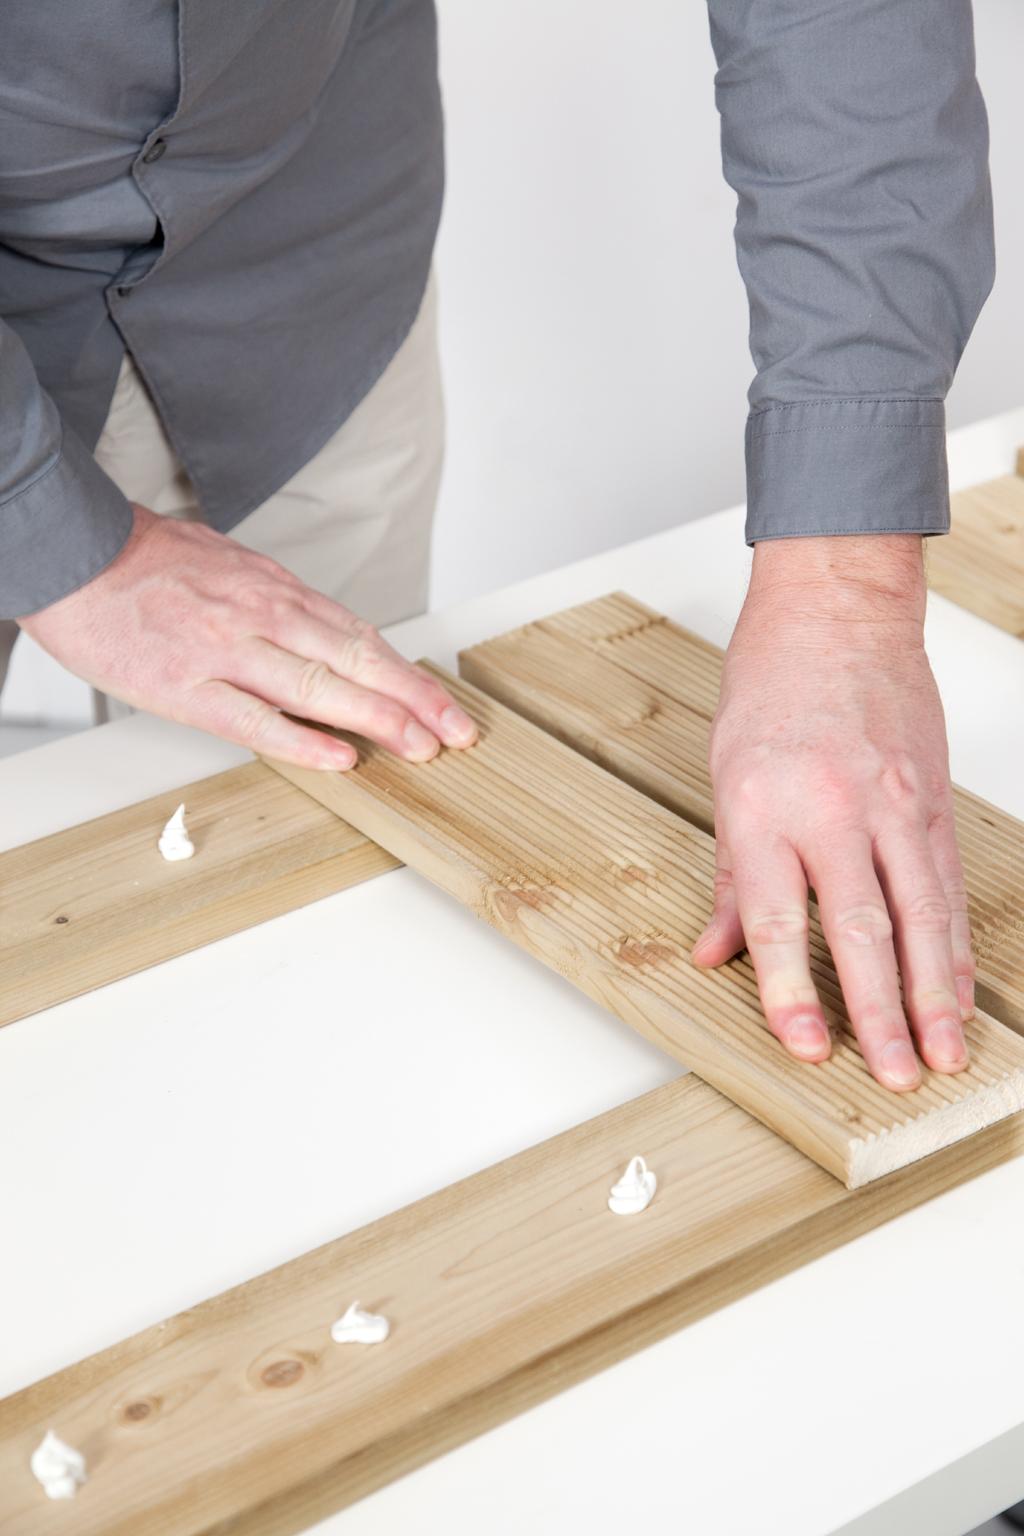 Creer une descente de baignoire en bois